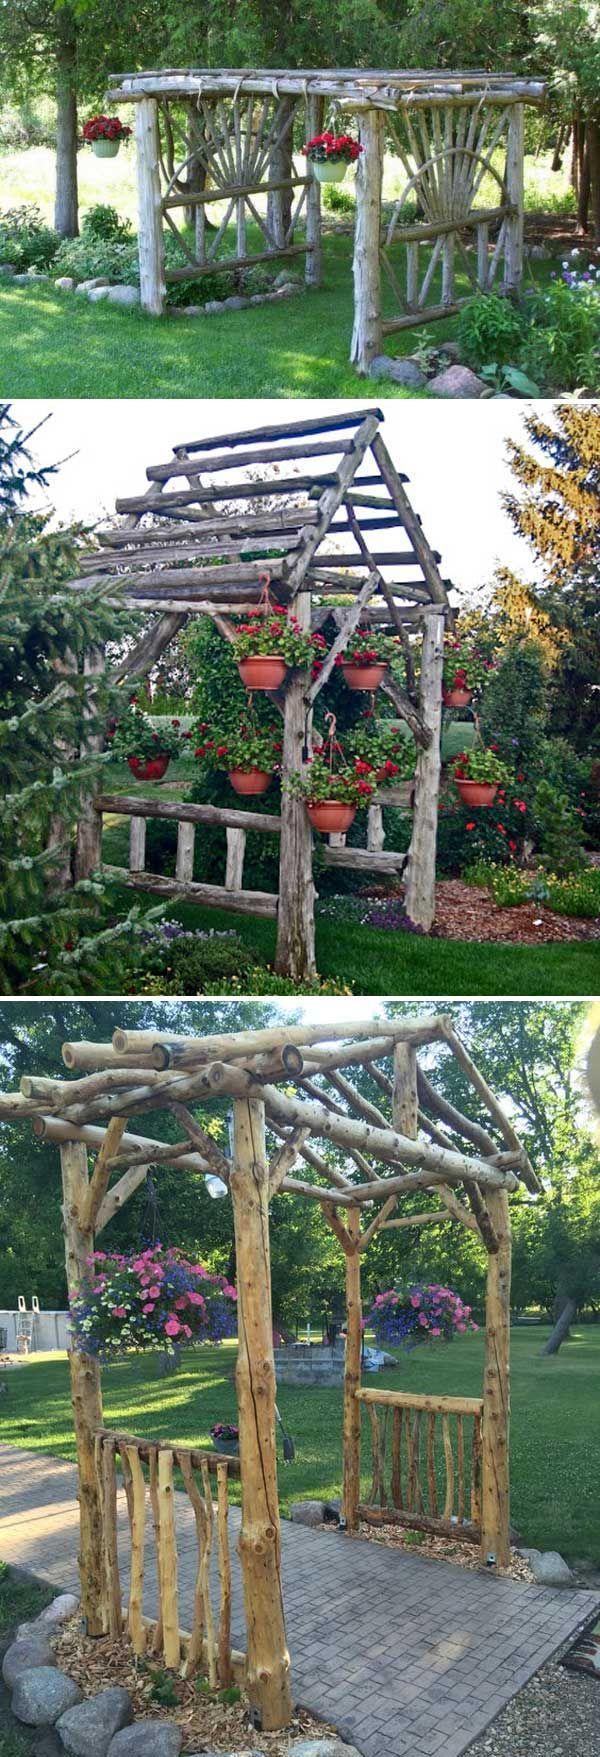 Vom Baumstumpf zum Garten Deko-Ideen … #Baum #Garten # Ideen # …